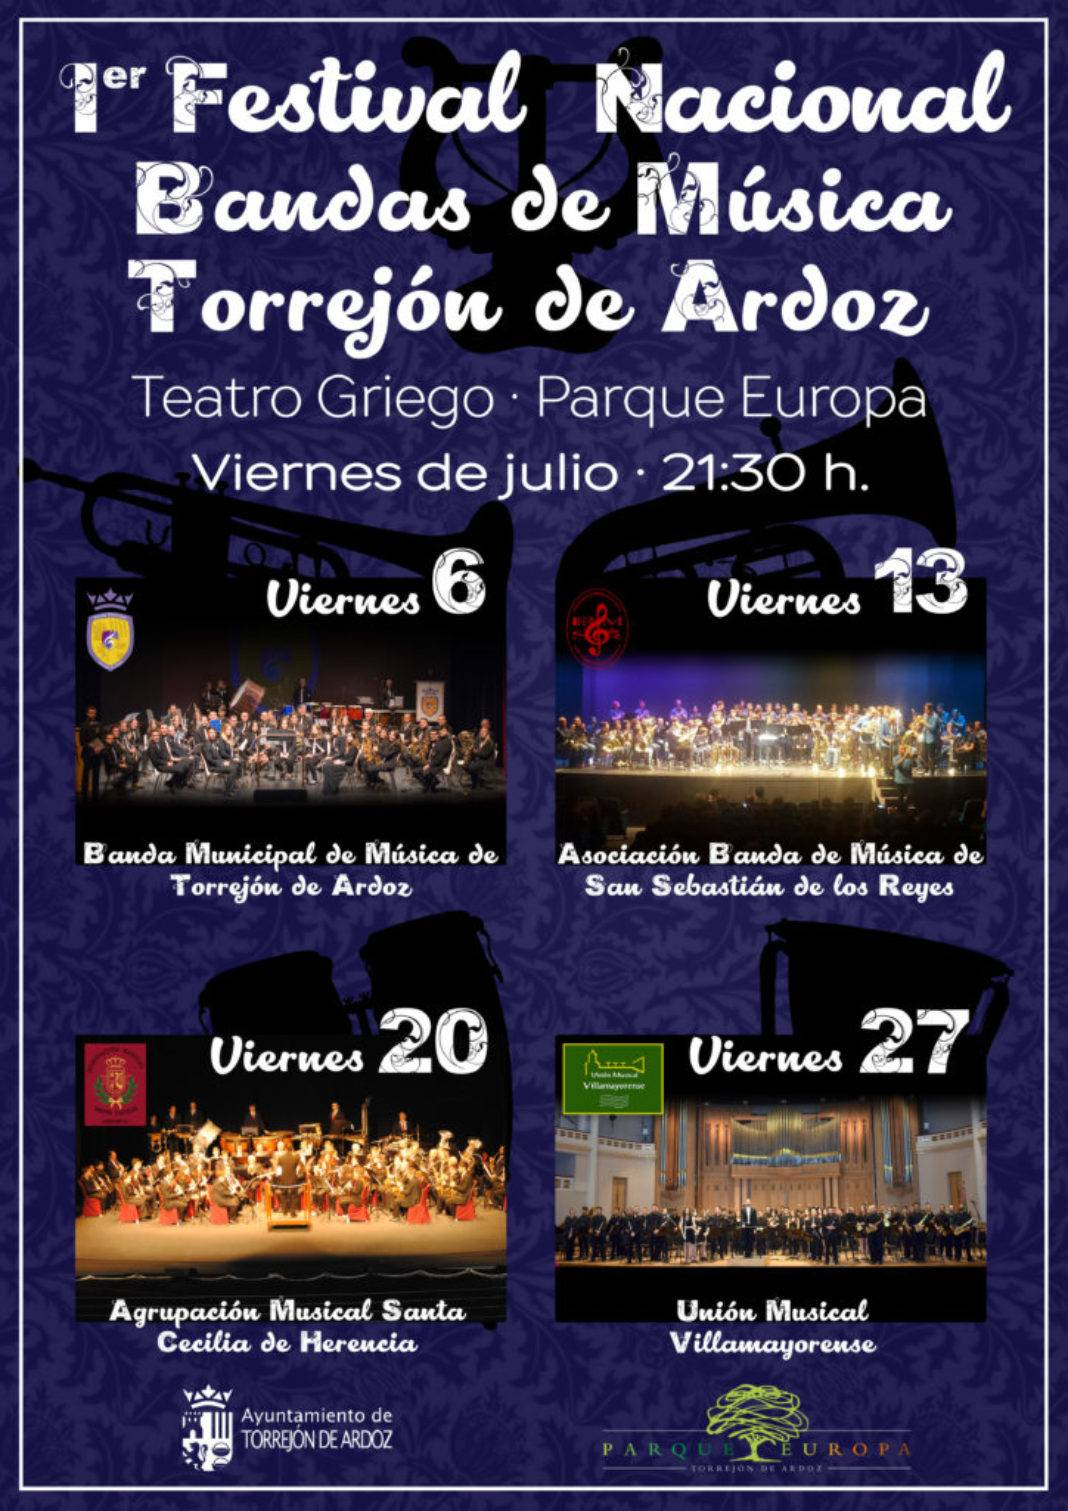 I Festival Nacional de Bandas de Música de Torrejón de Ardoz 1068x1511 - Herencia en el I Festival Nacional de Bandas de Música de Torrejón de Ardoz